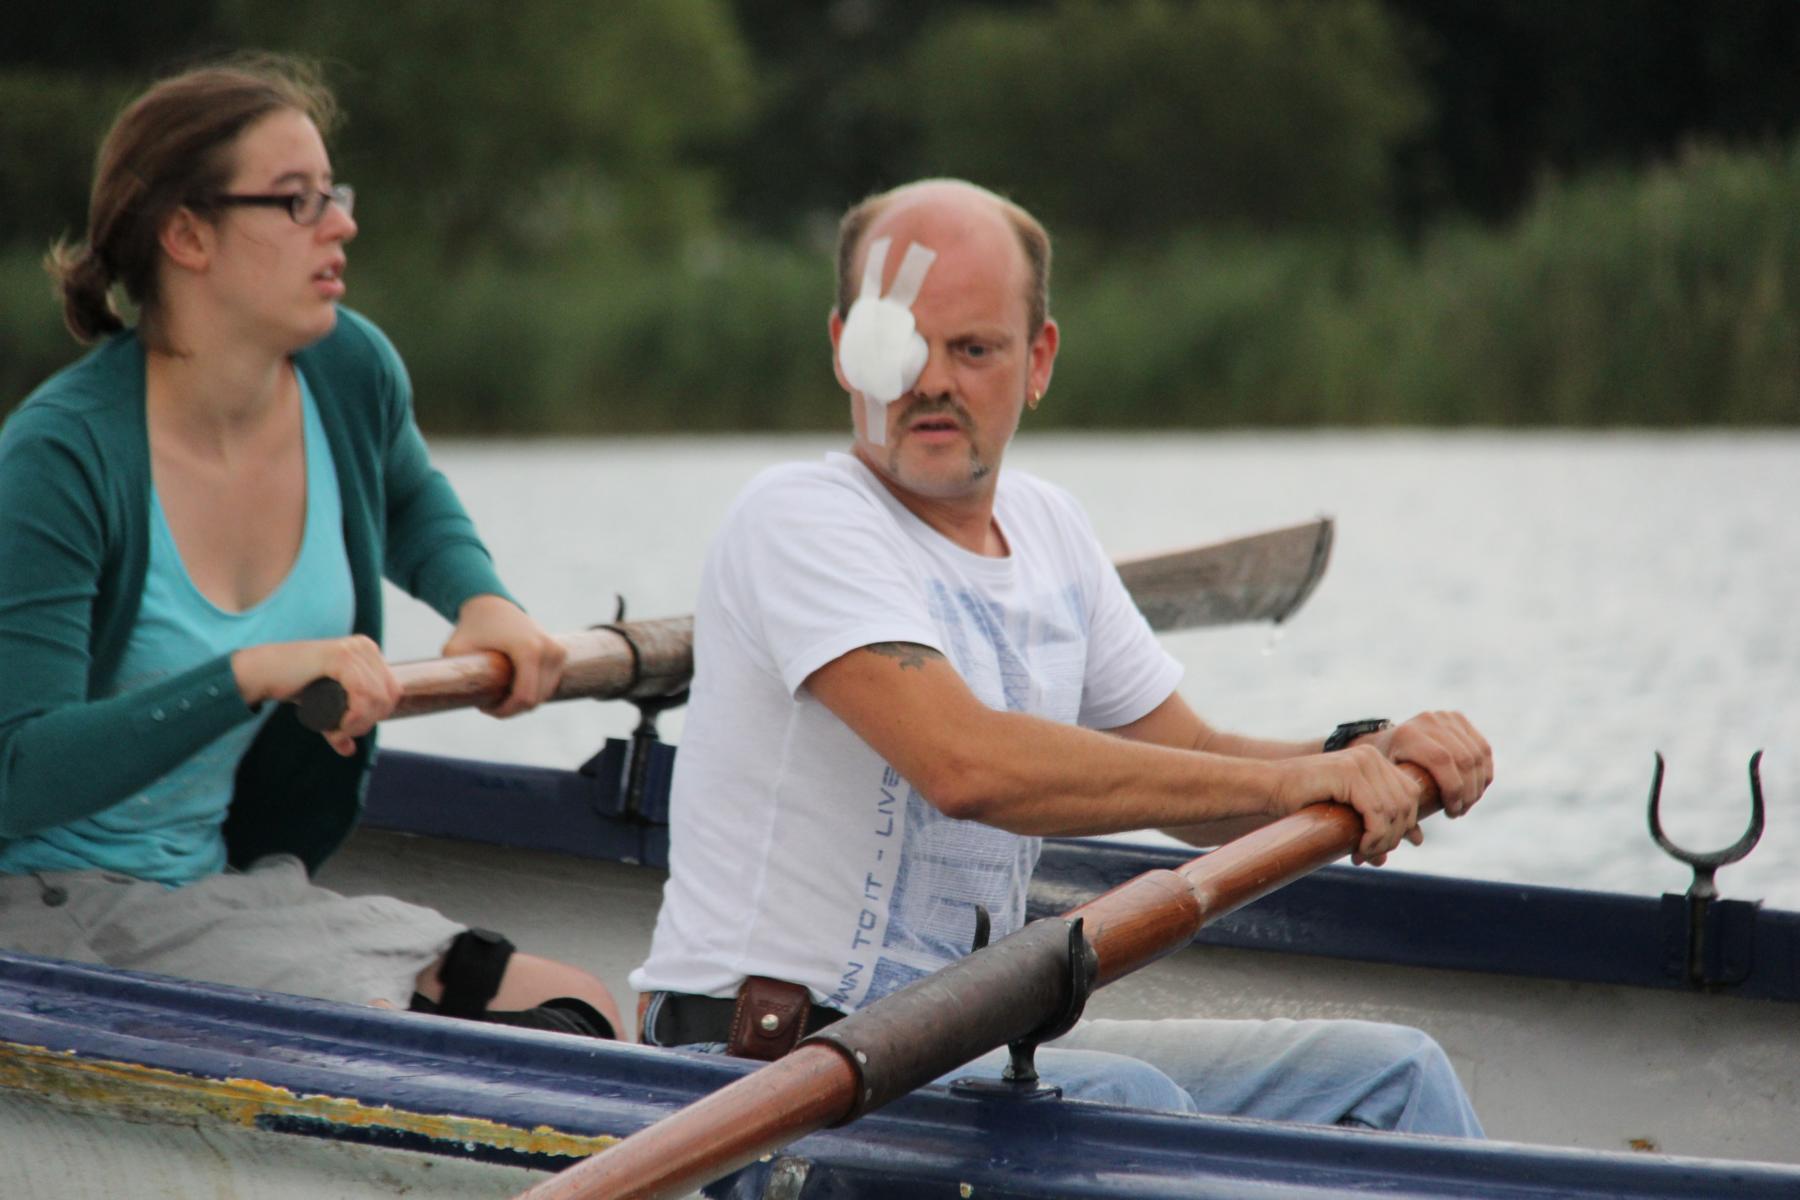 Piraten an Bord?